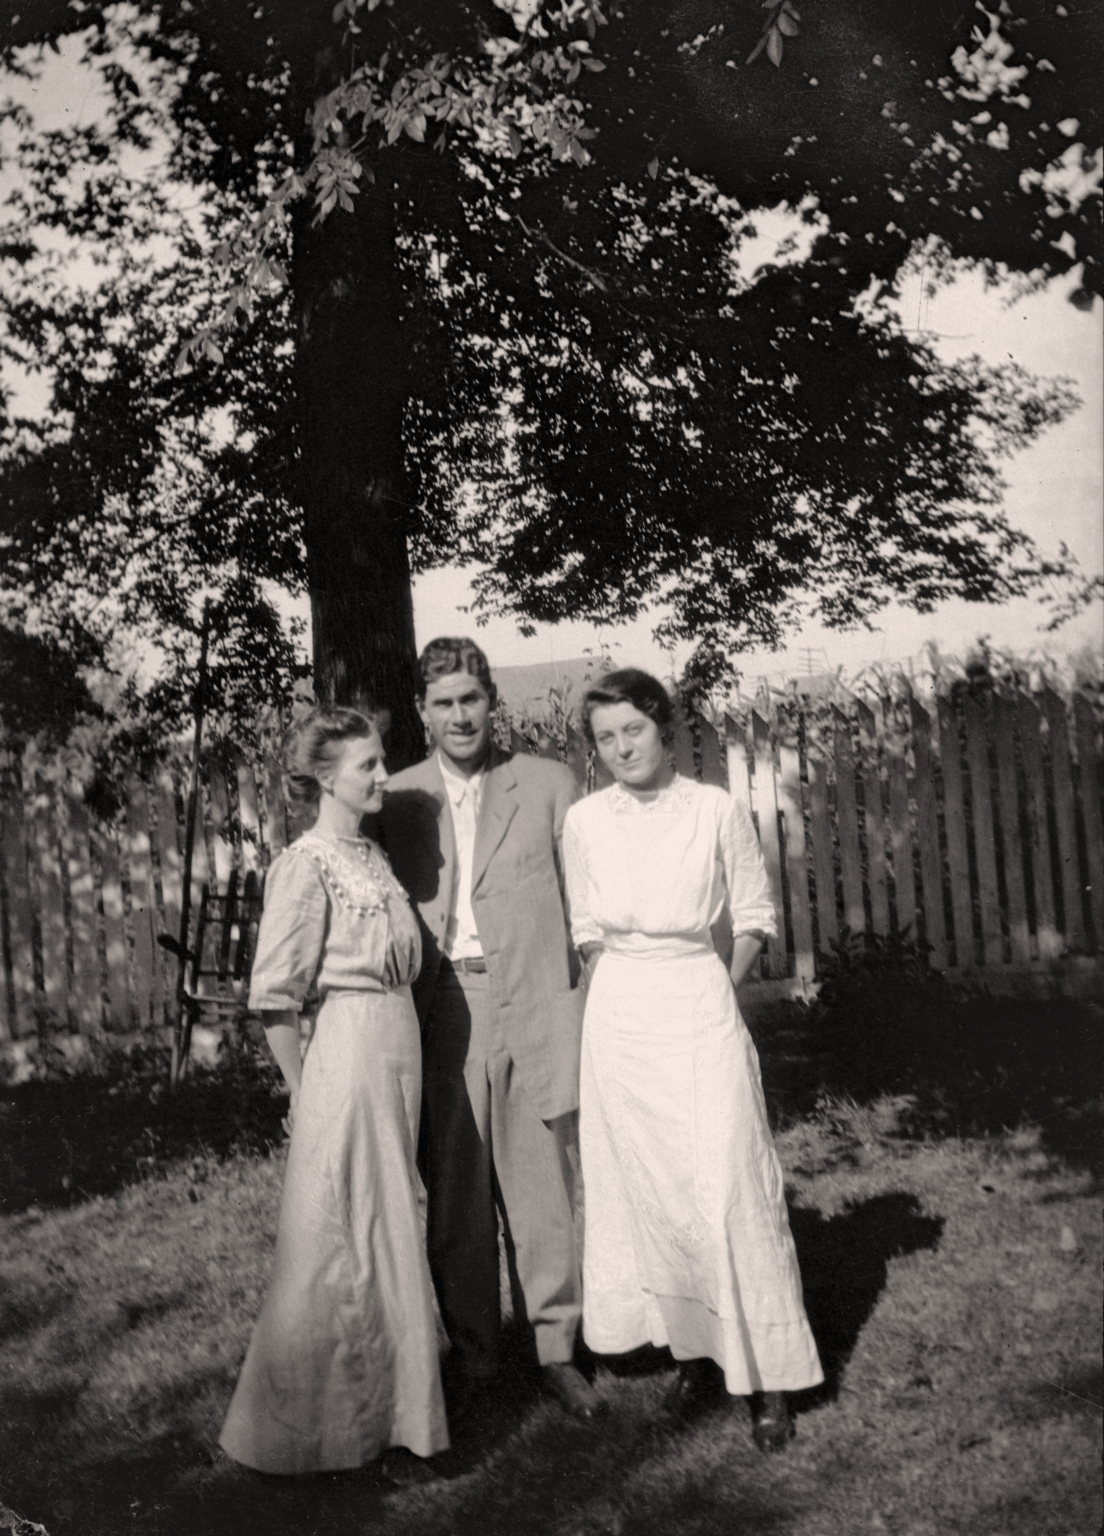 Aline Utterback, Ed Pepper and Ruth Bell